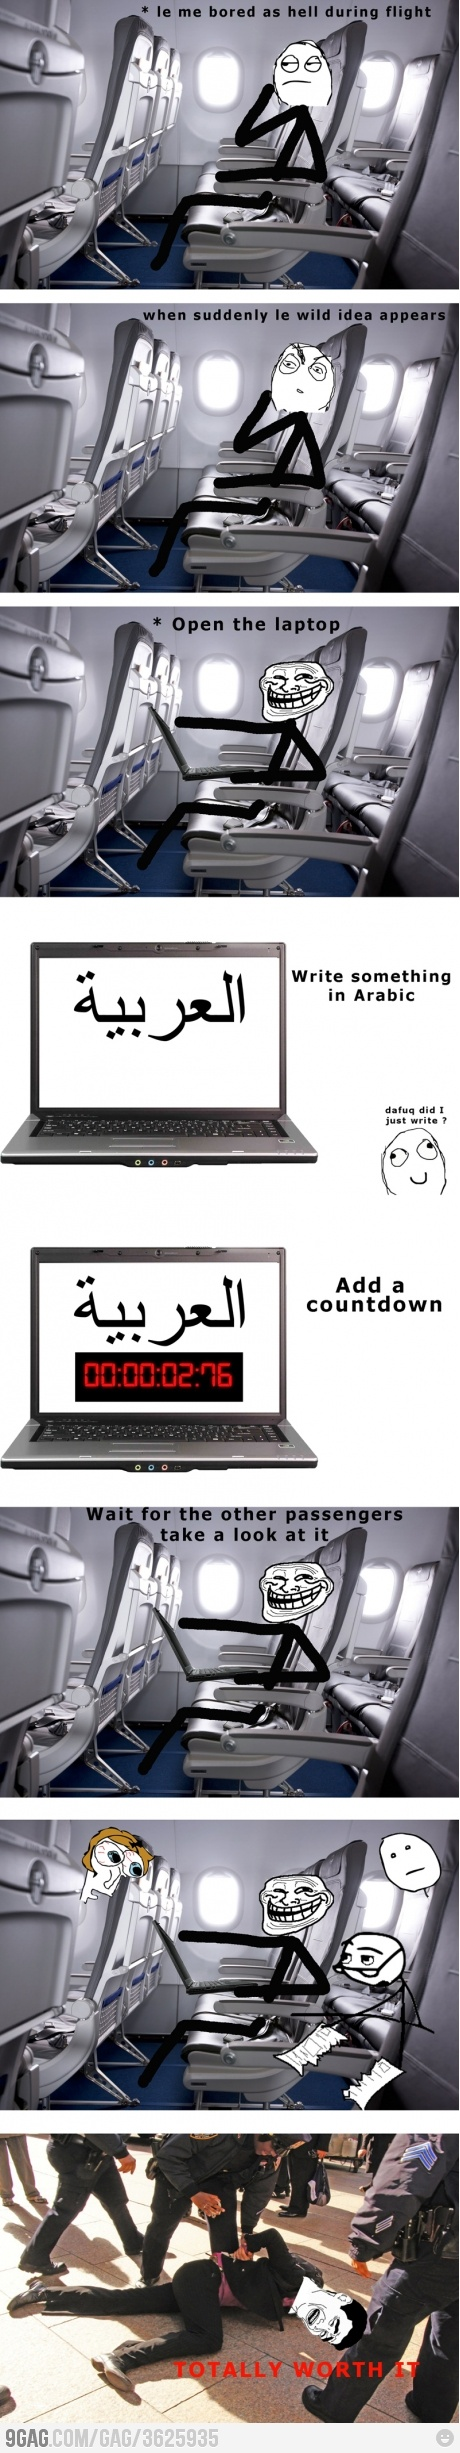 d794d396149818acf29fff9caa368986 funny racist jokes funny texts 112 best arabs tho images on pinterest arab problems, arabic,Funny Arab Meme Airplane